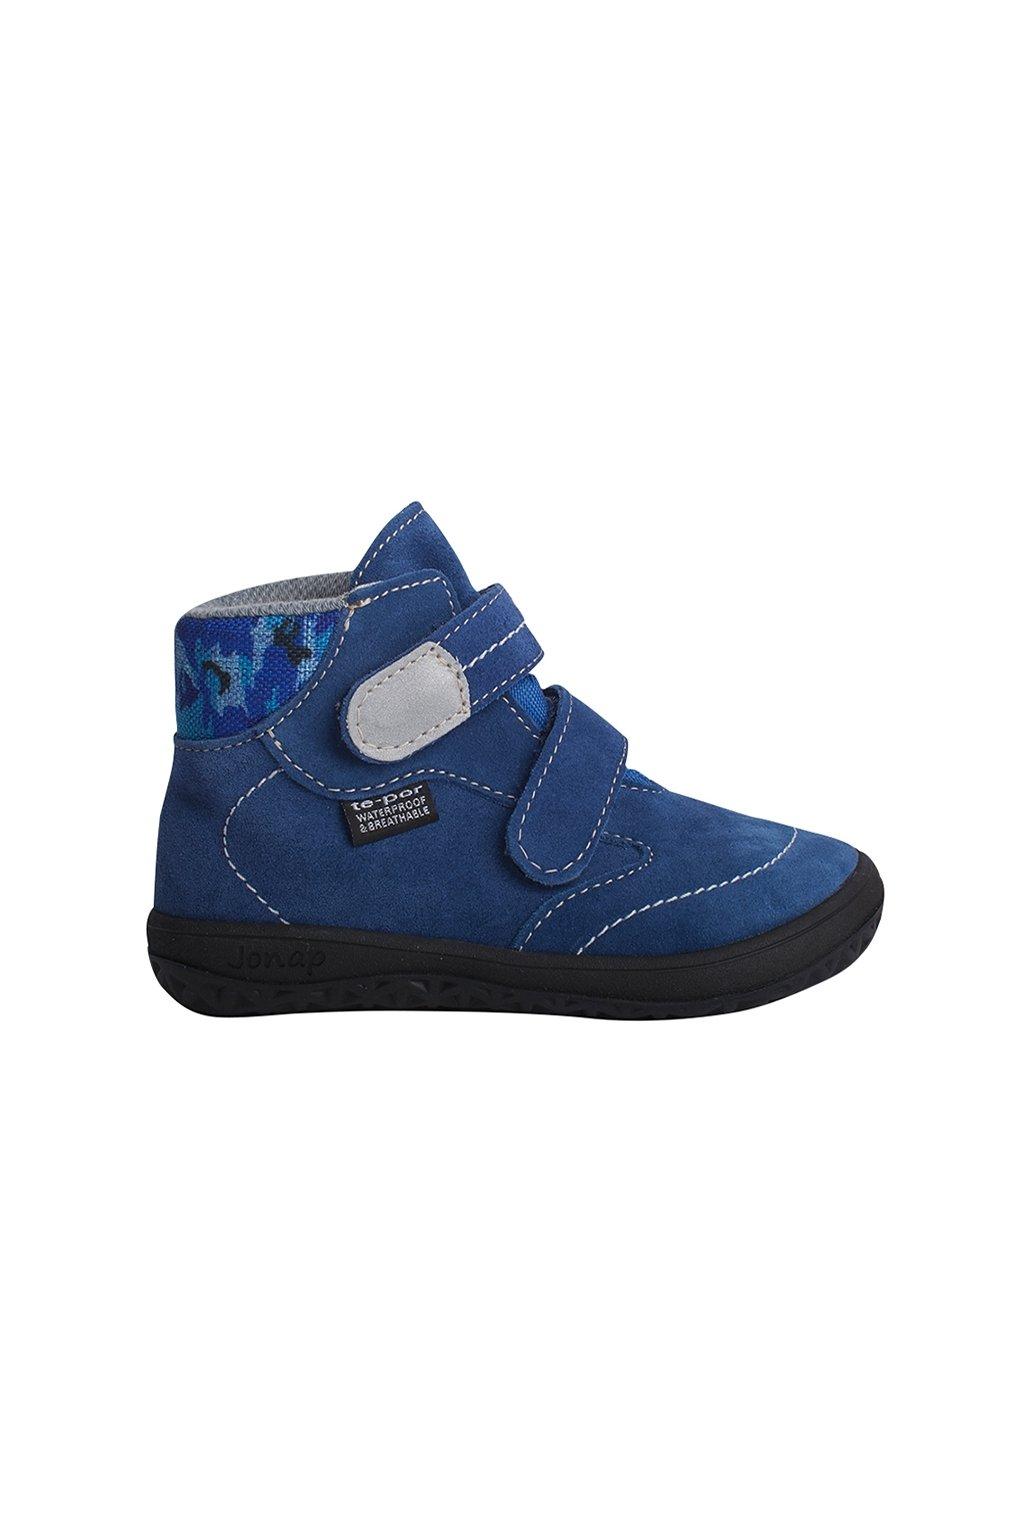 Jonap B3 Modra Slim